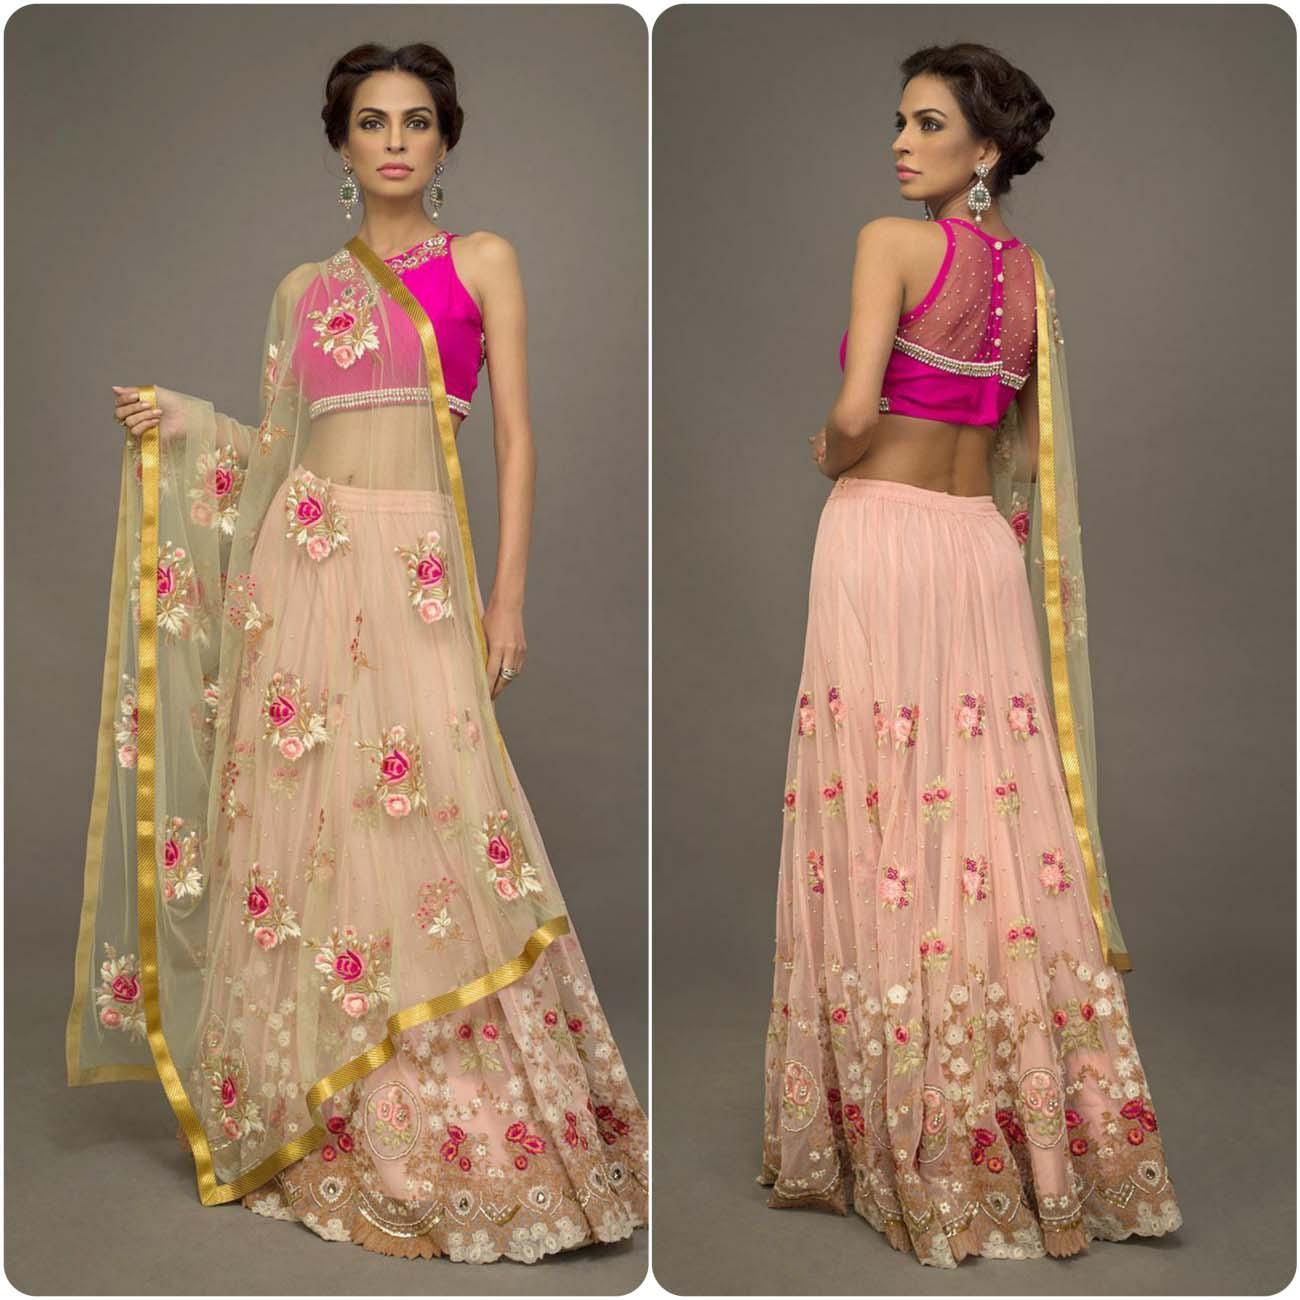 Deepak perwani Wedding Dresses Collection Fo Women 2016-2017...styloplanet (6)